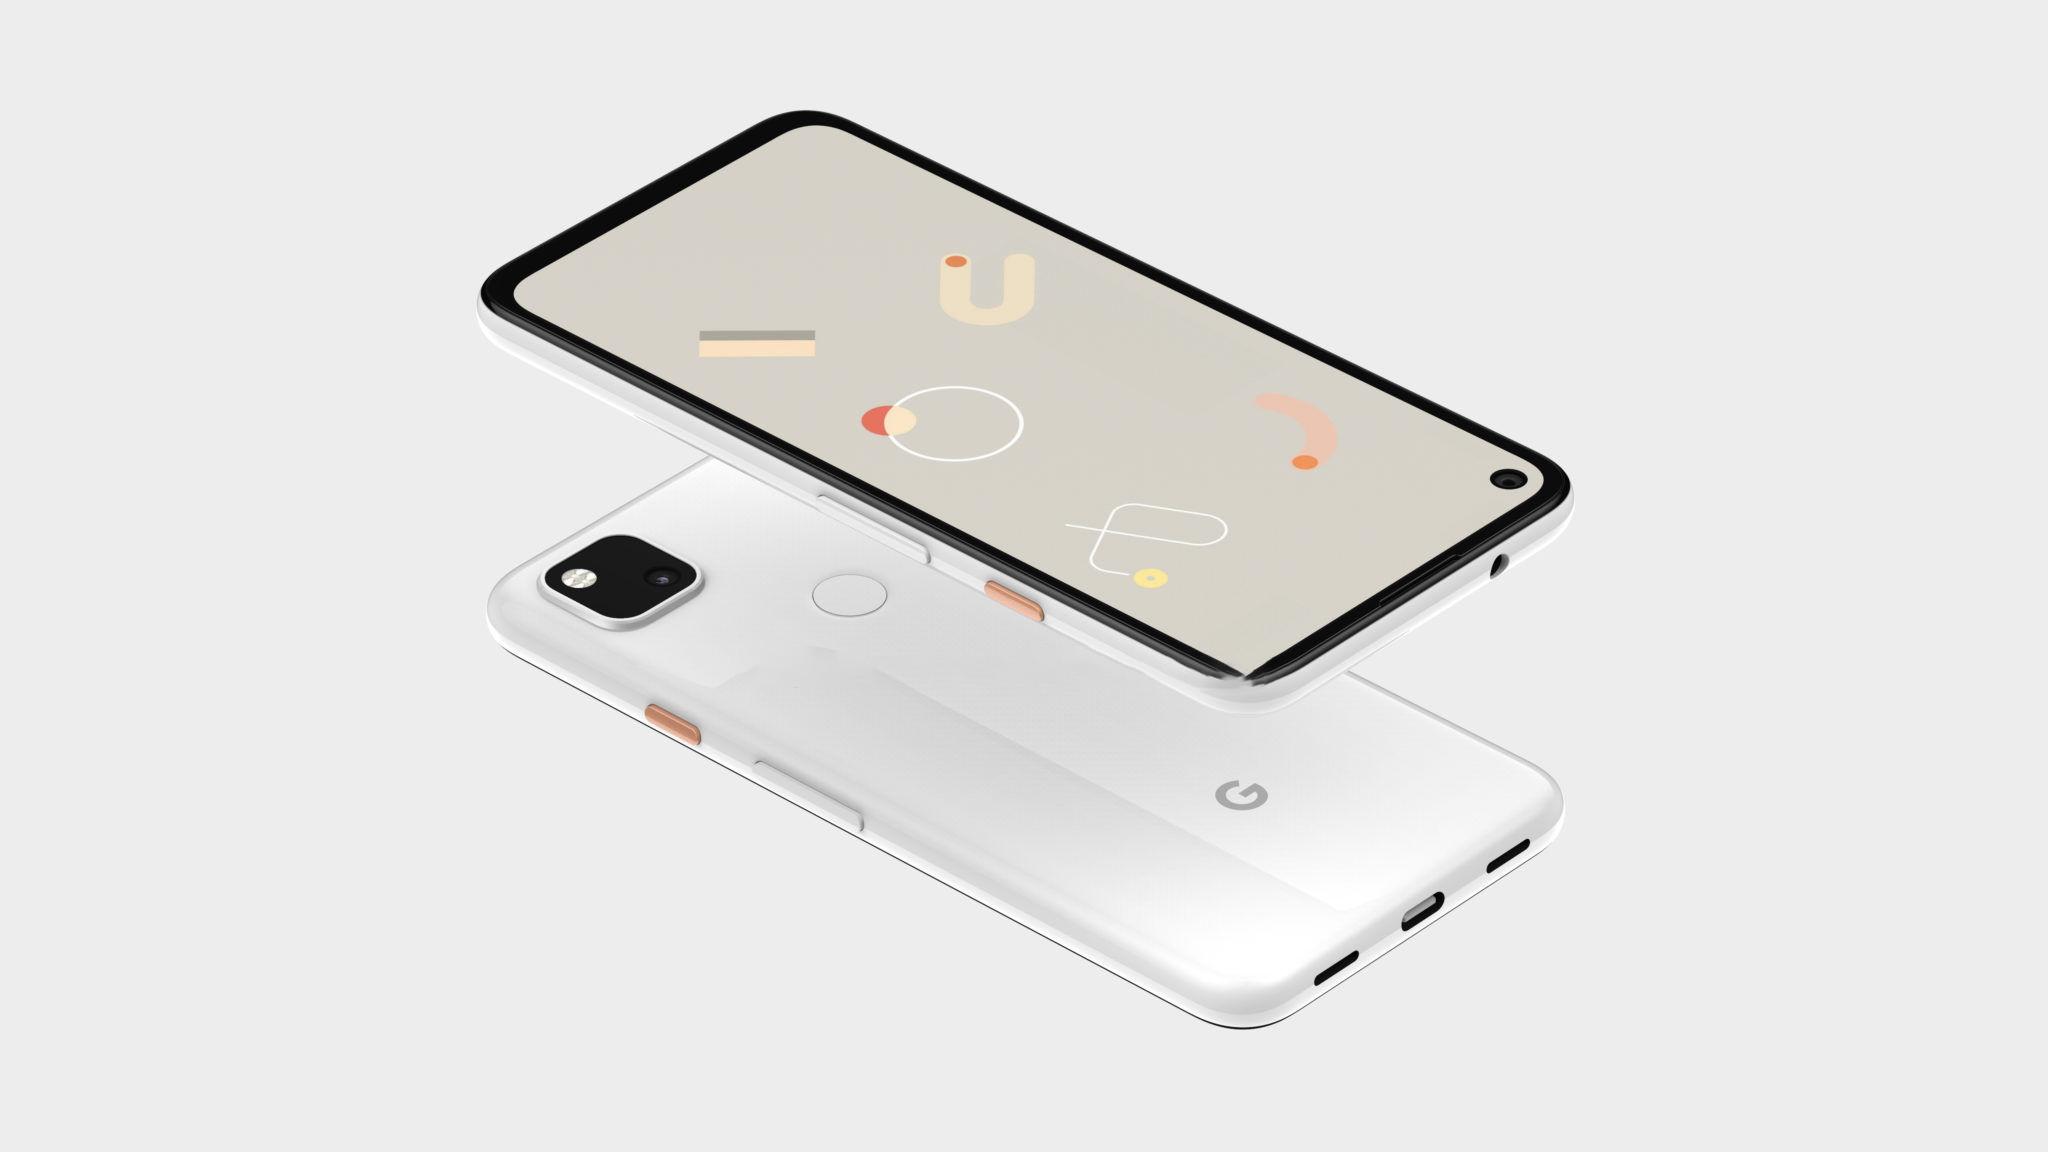 Смартфон Google Pixel 4a сравнили по производительности с OnePlus Nord